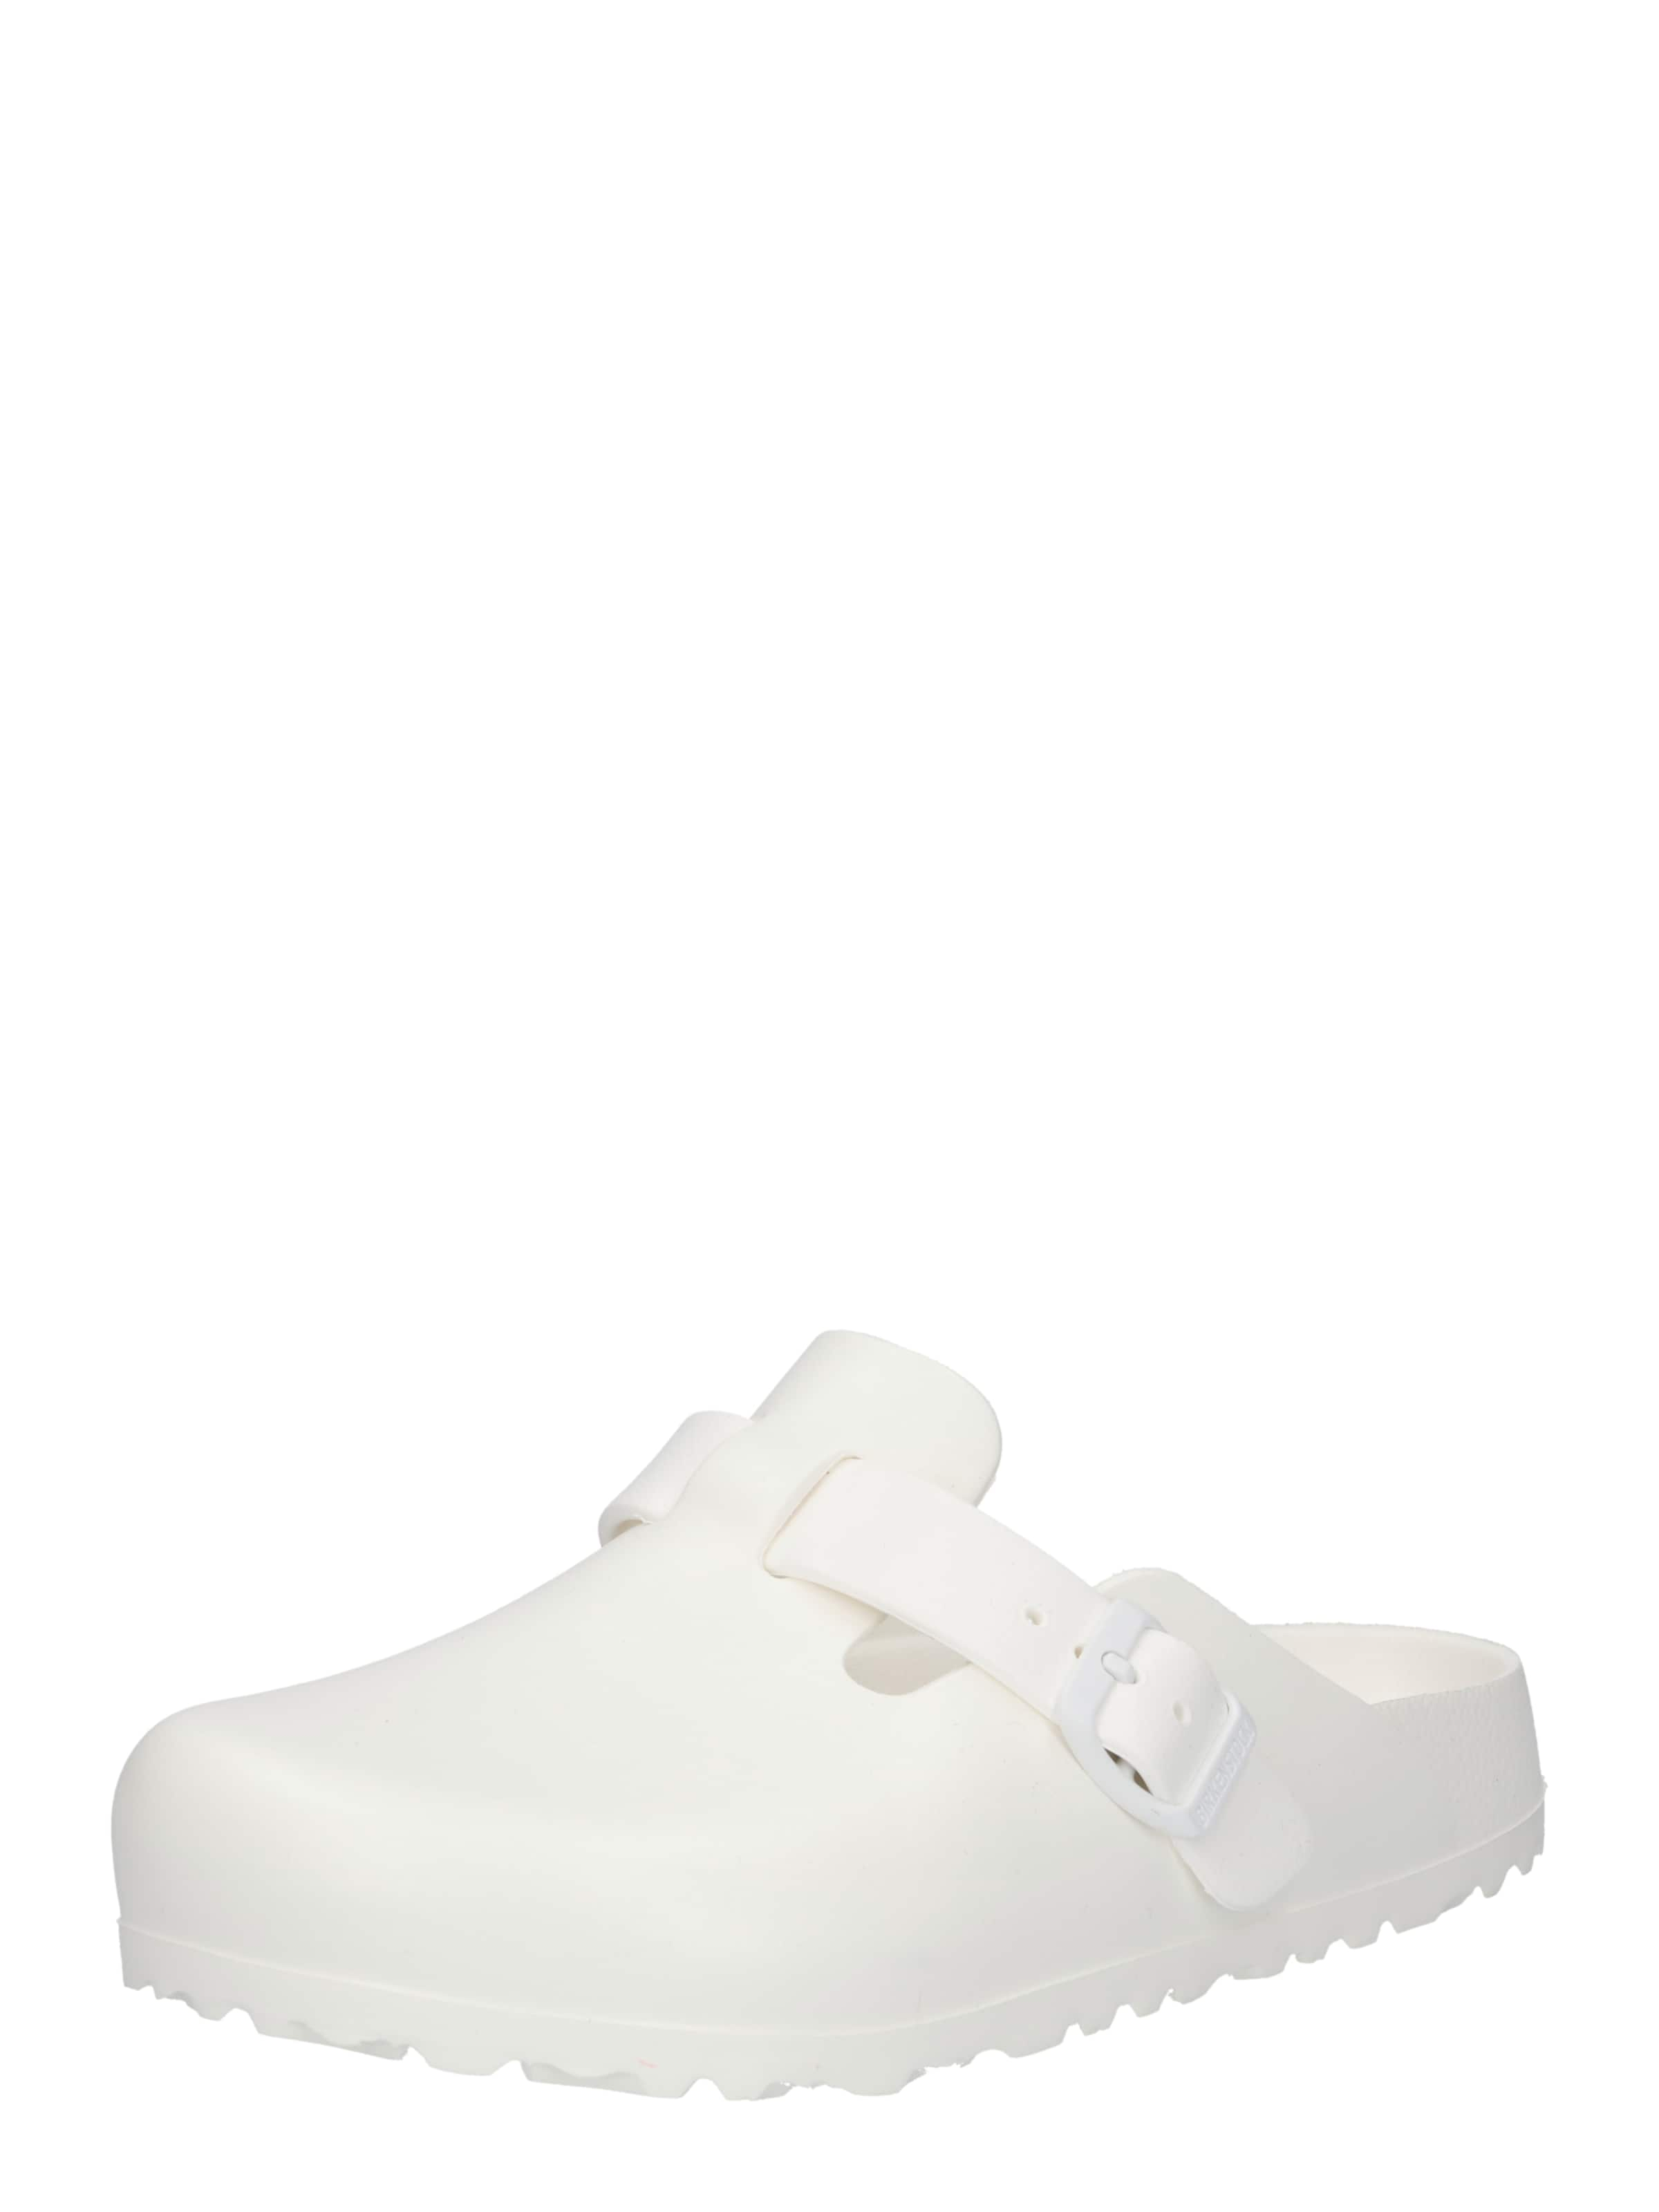 BIRKENSTOCK Pantolette Boston Verschleißfeste billige Schuhe